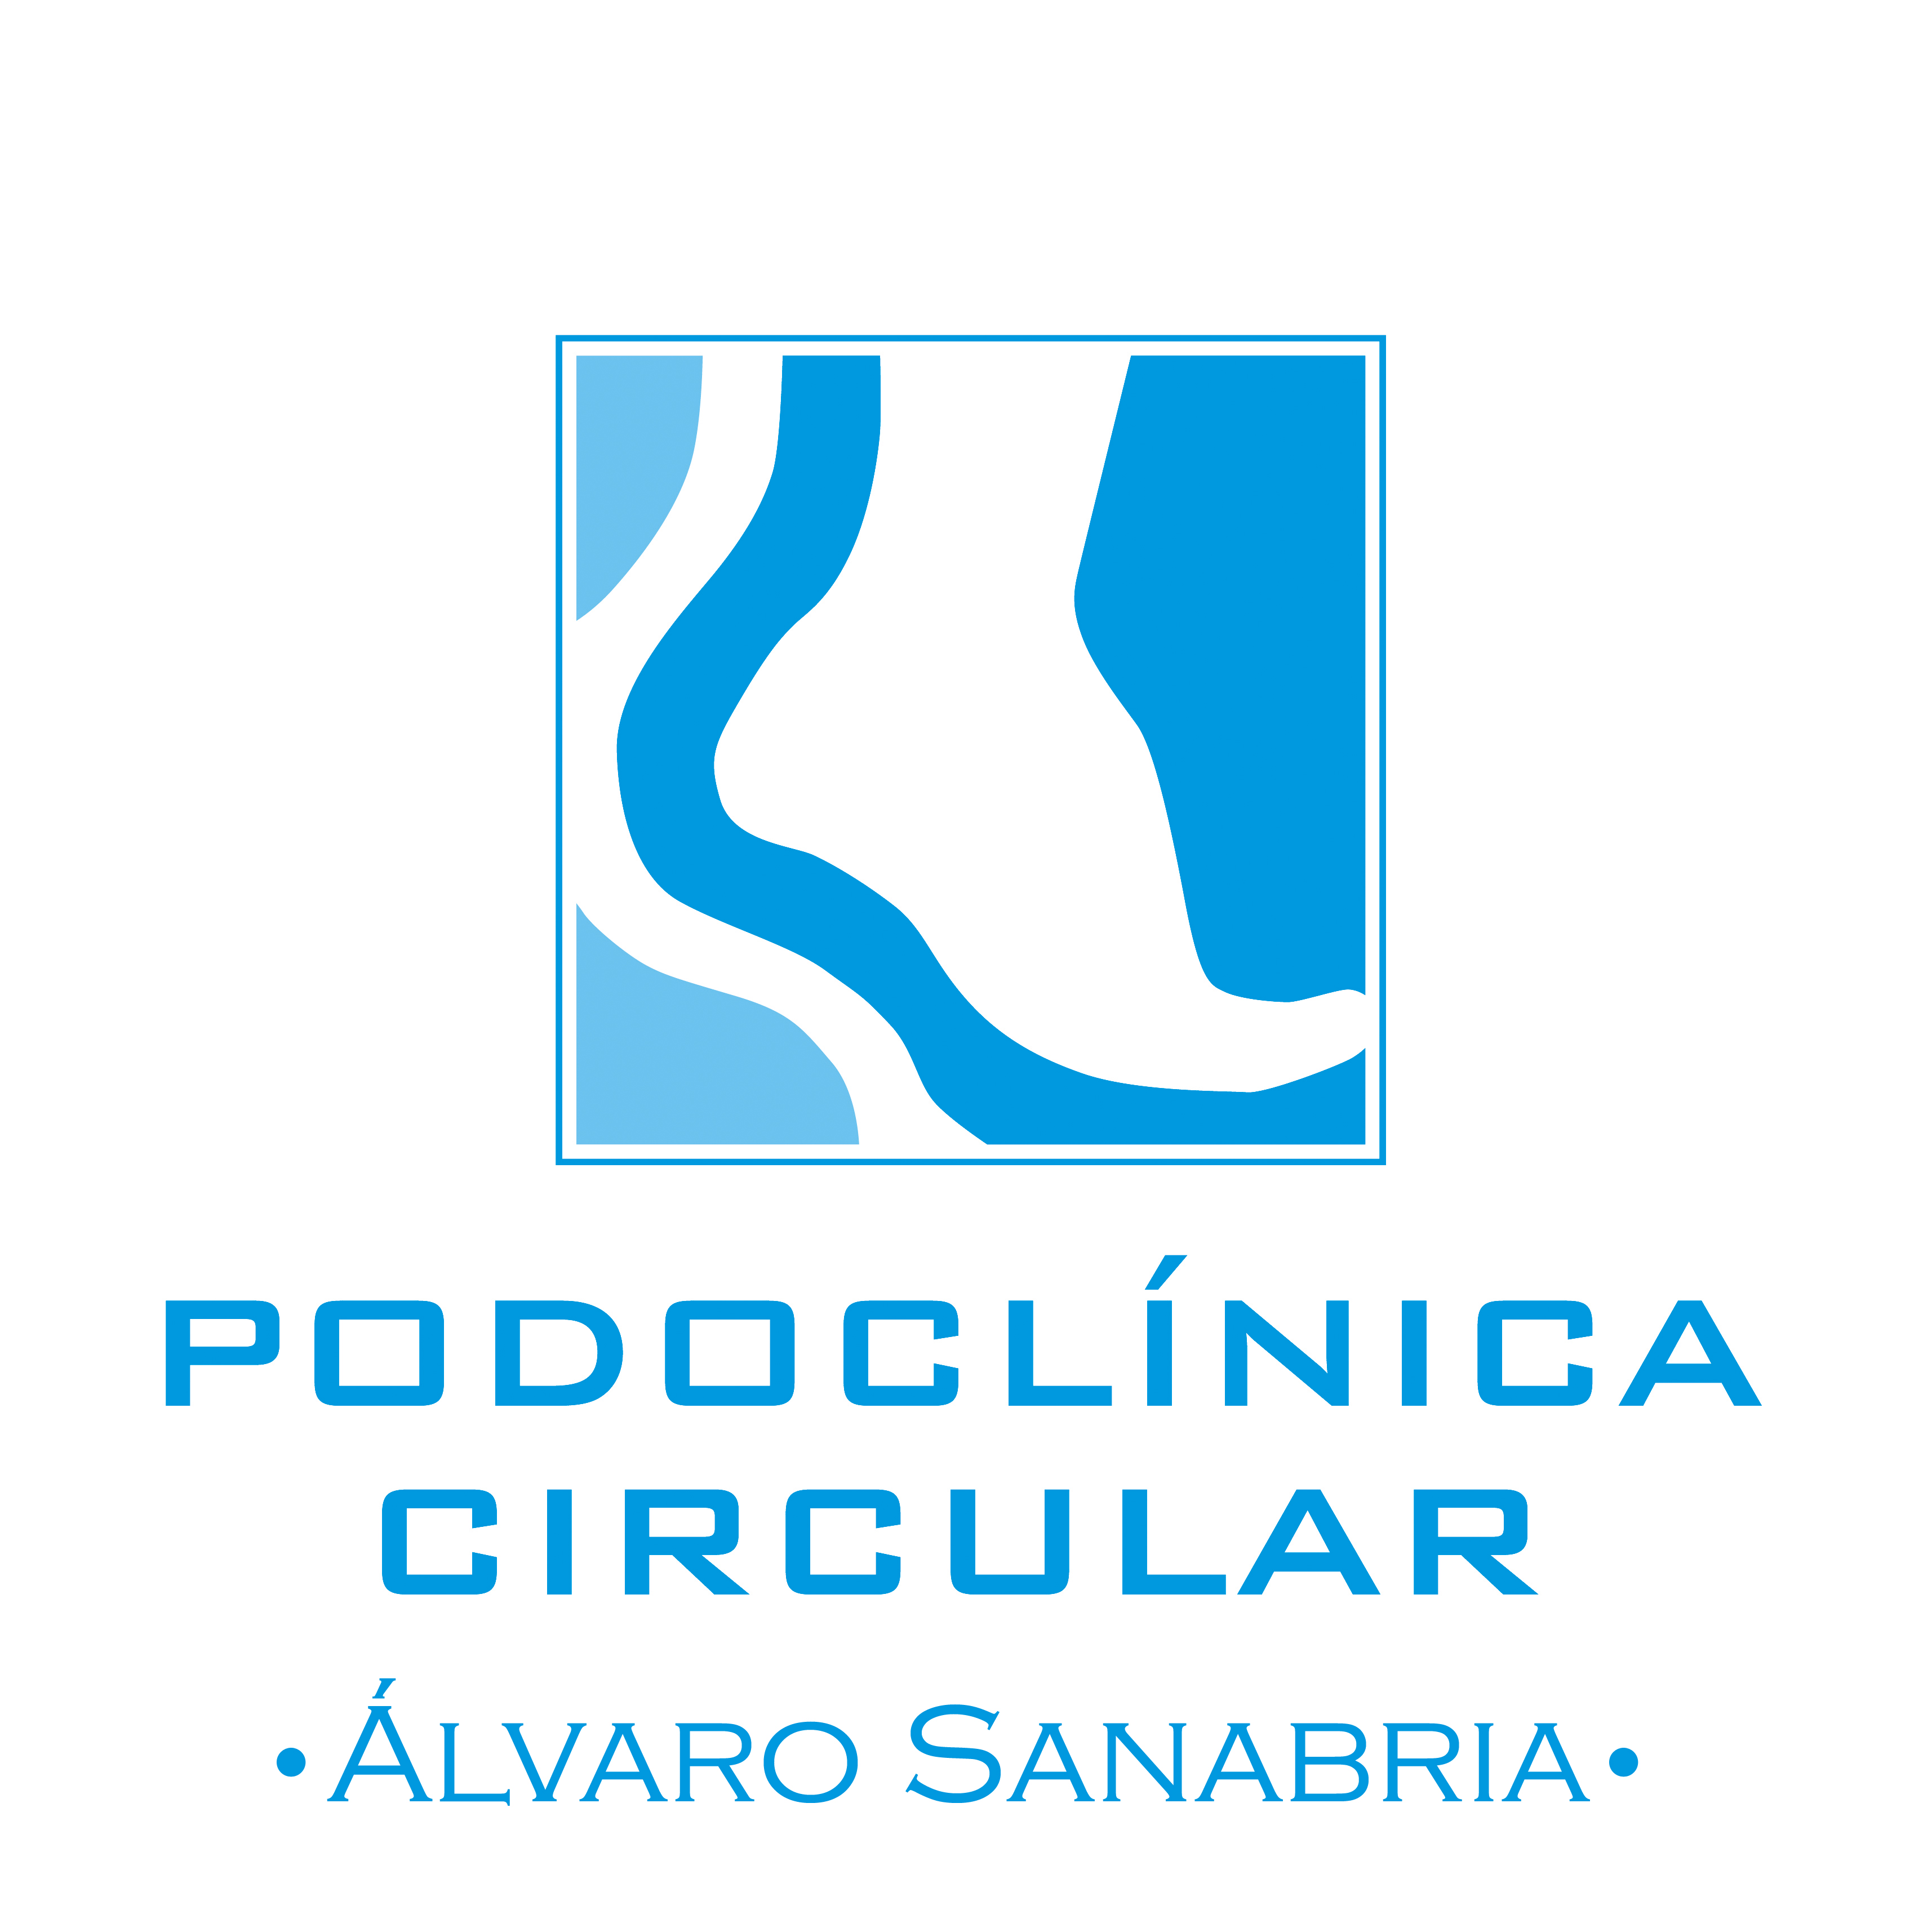 Podoclínica Circular - Álvaro Sanabria